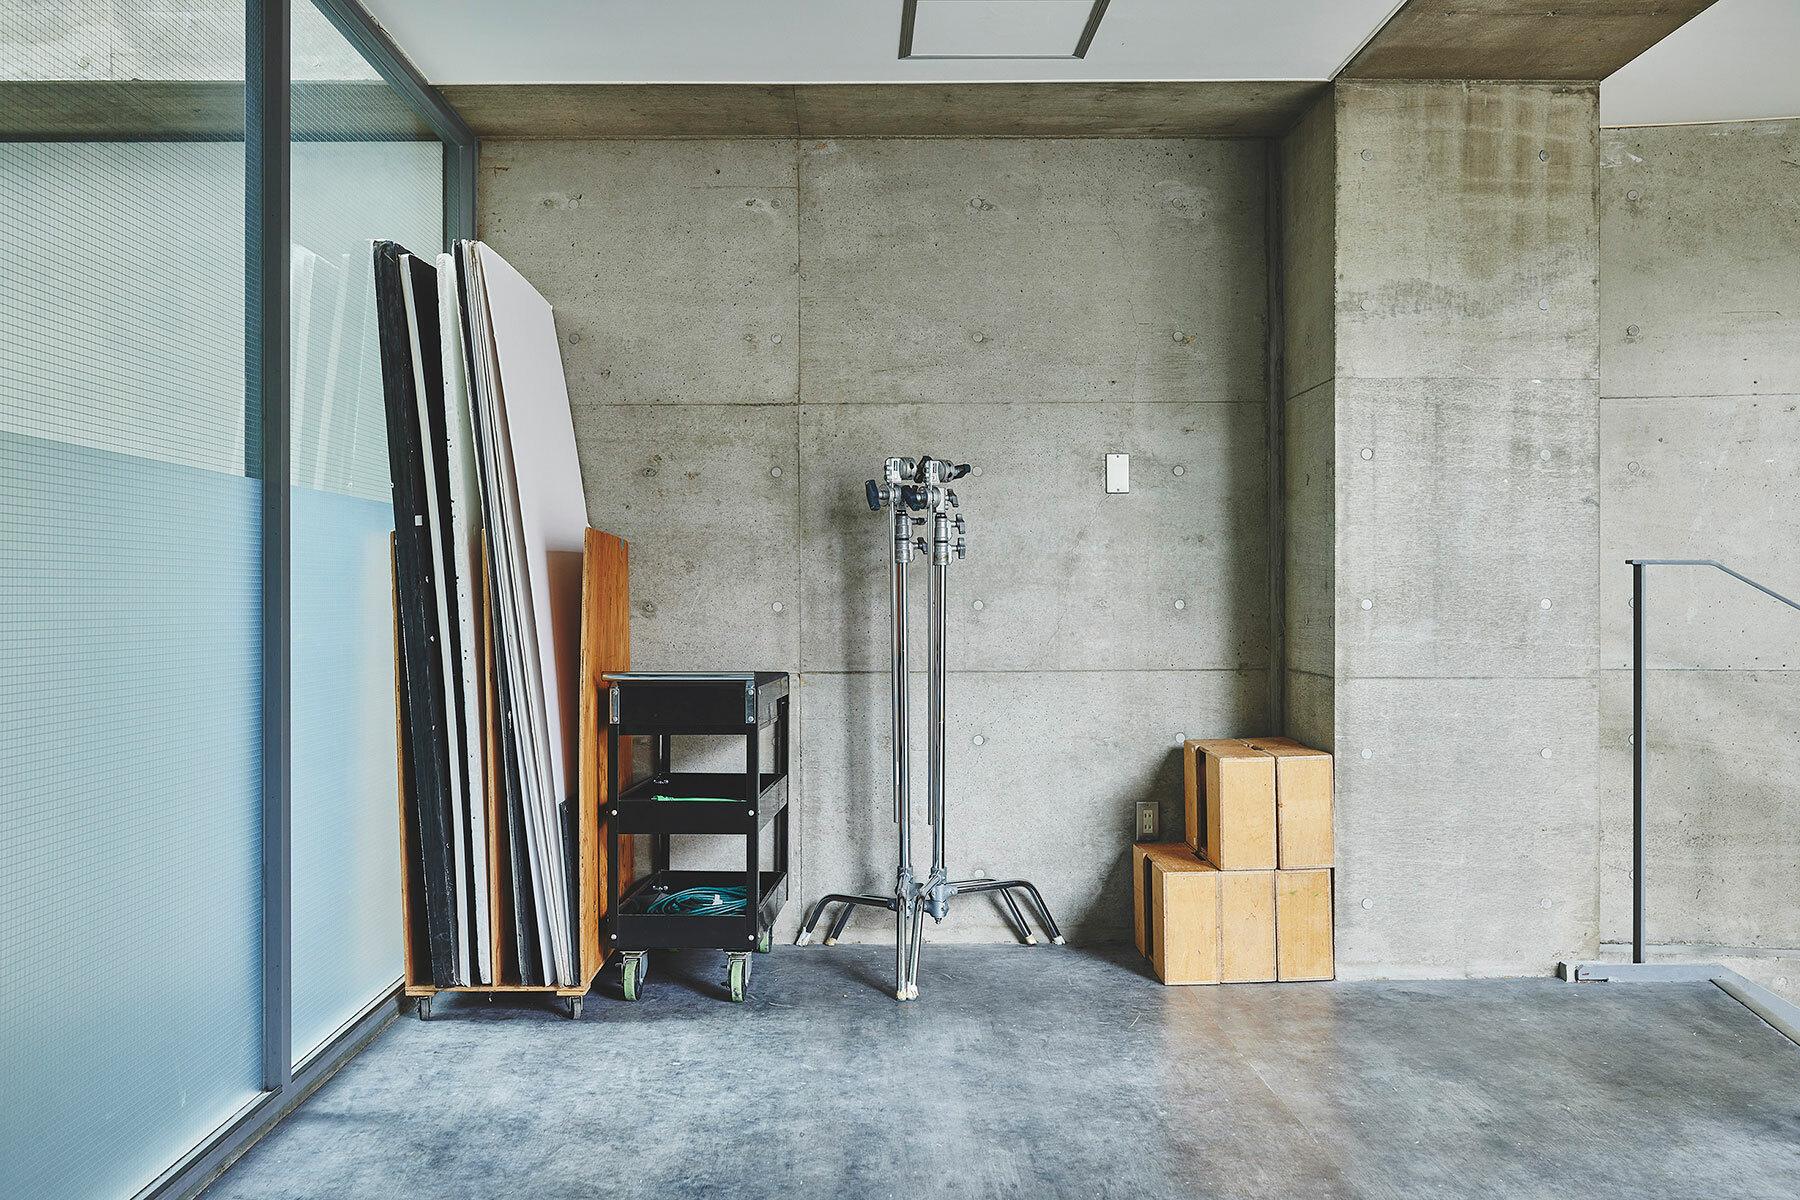 PORCH Shinagawa studio 3F(ポーチ シナガワスタジオ)【Option】Common areas